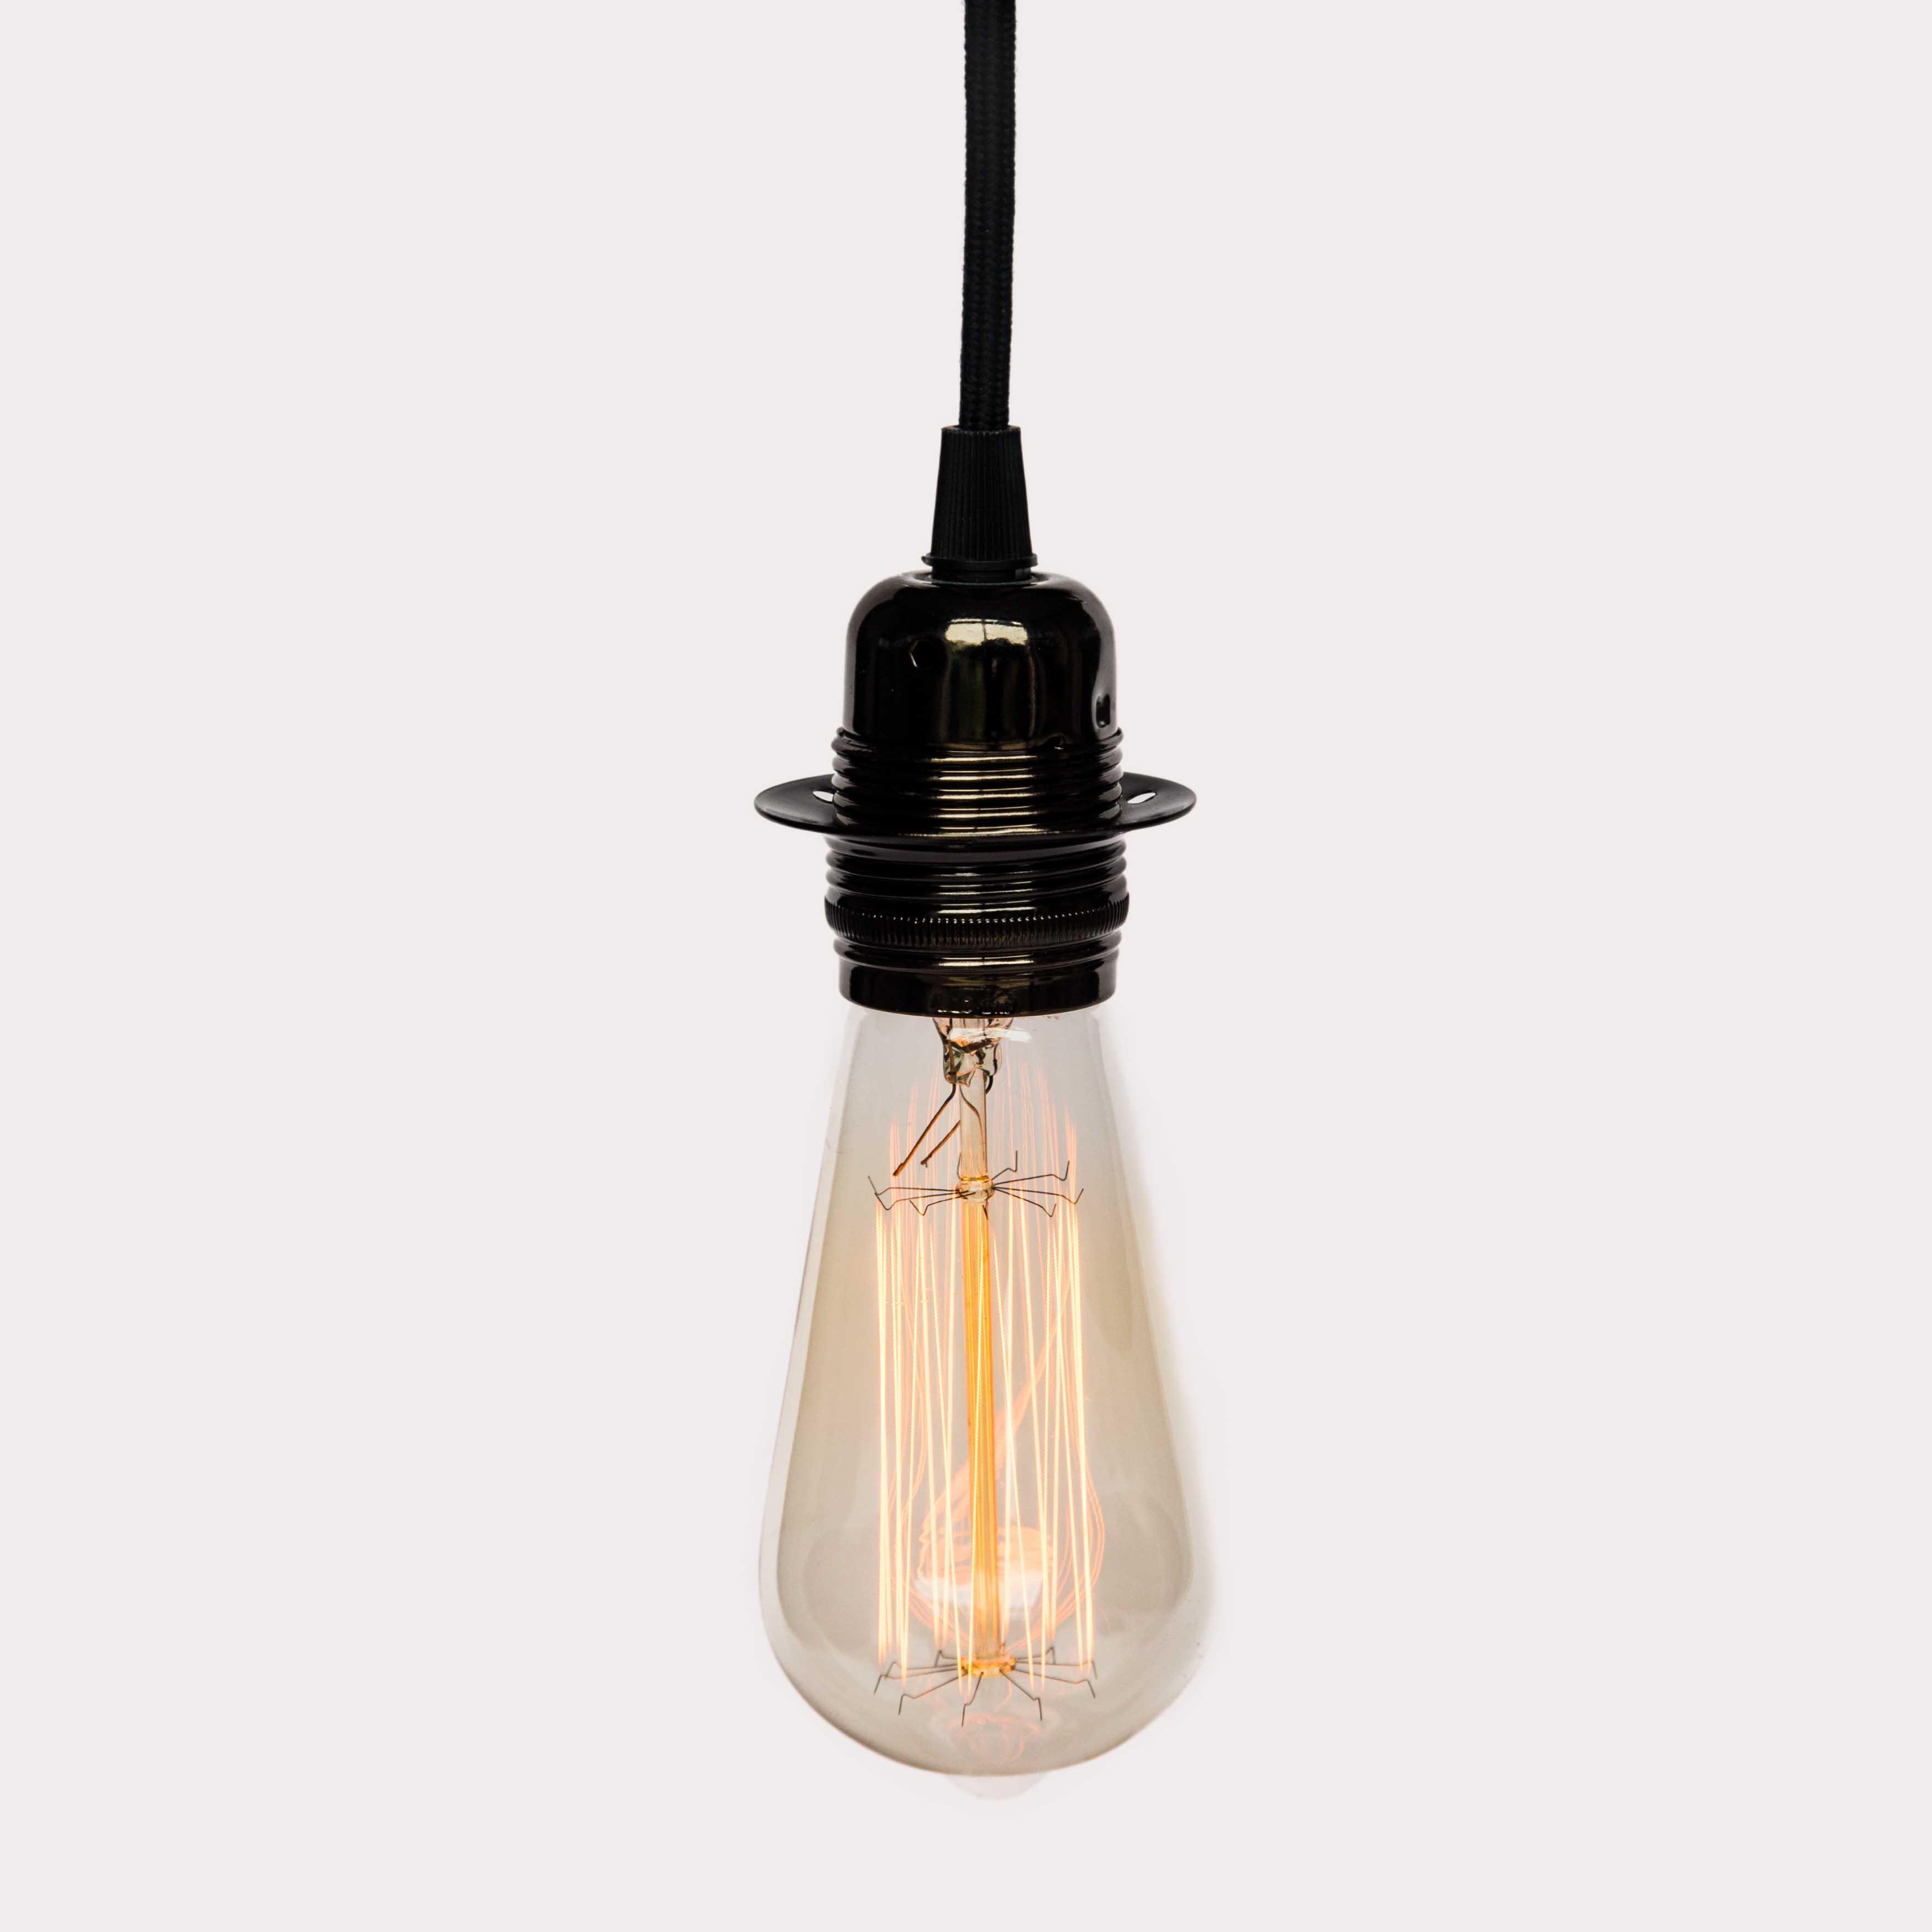 Edison Teardrop Squirrel Cage Large Vintage Filament Light